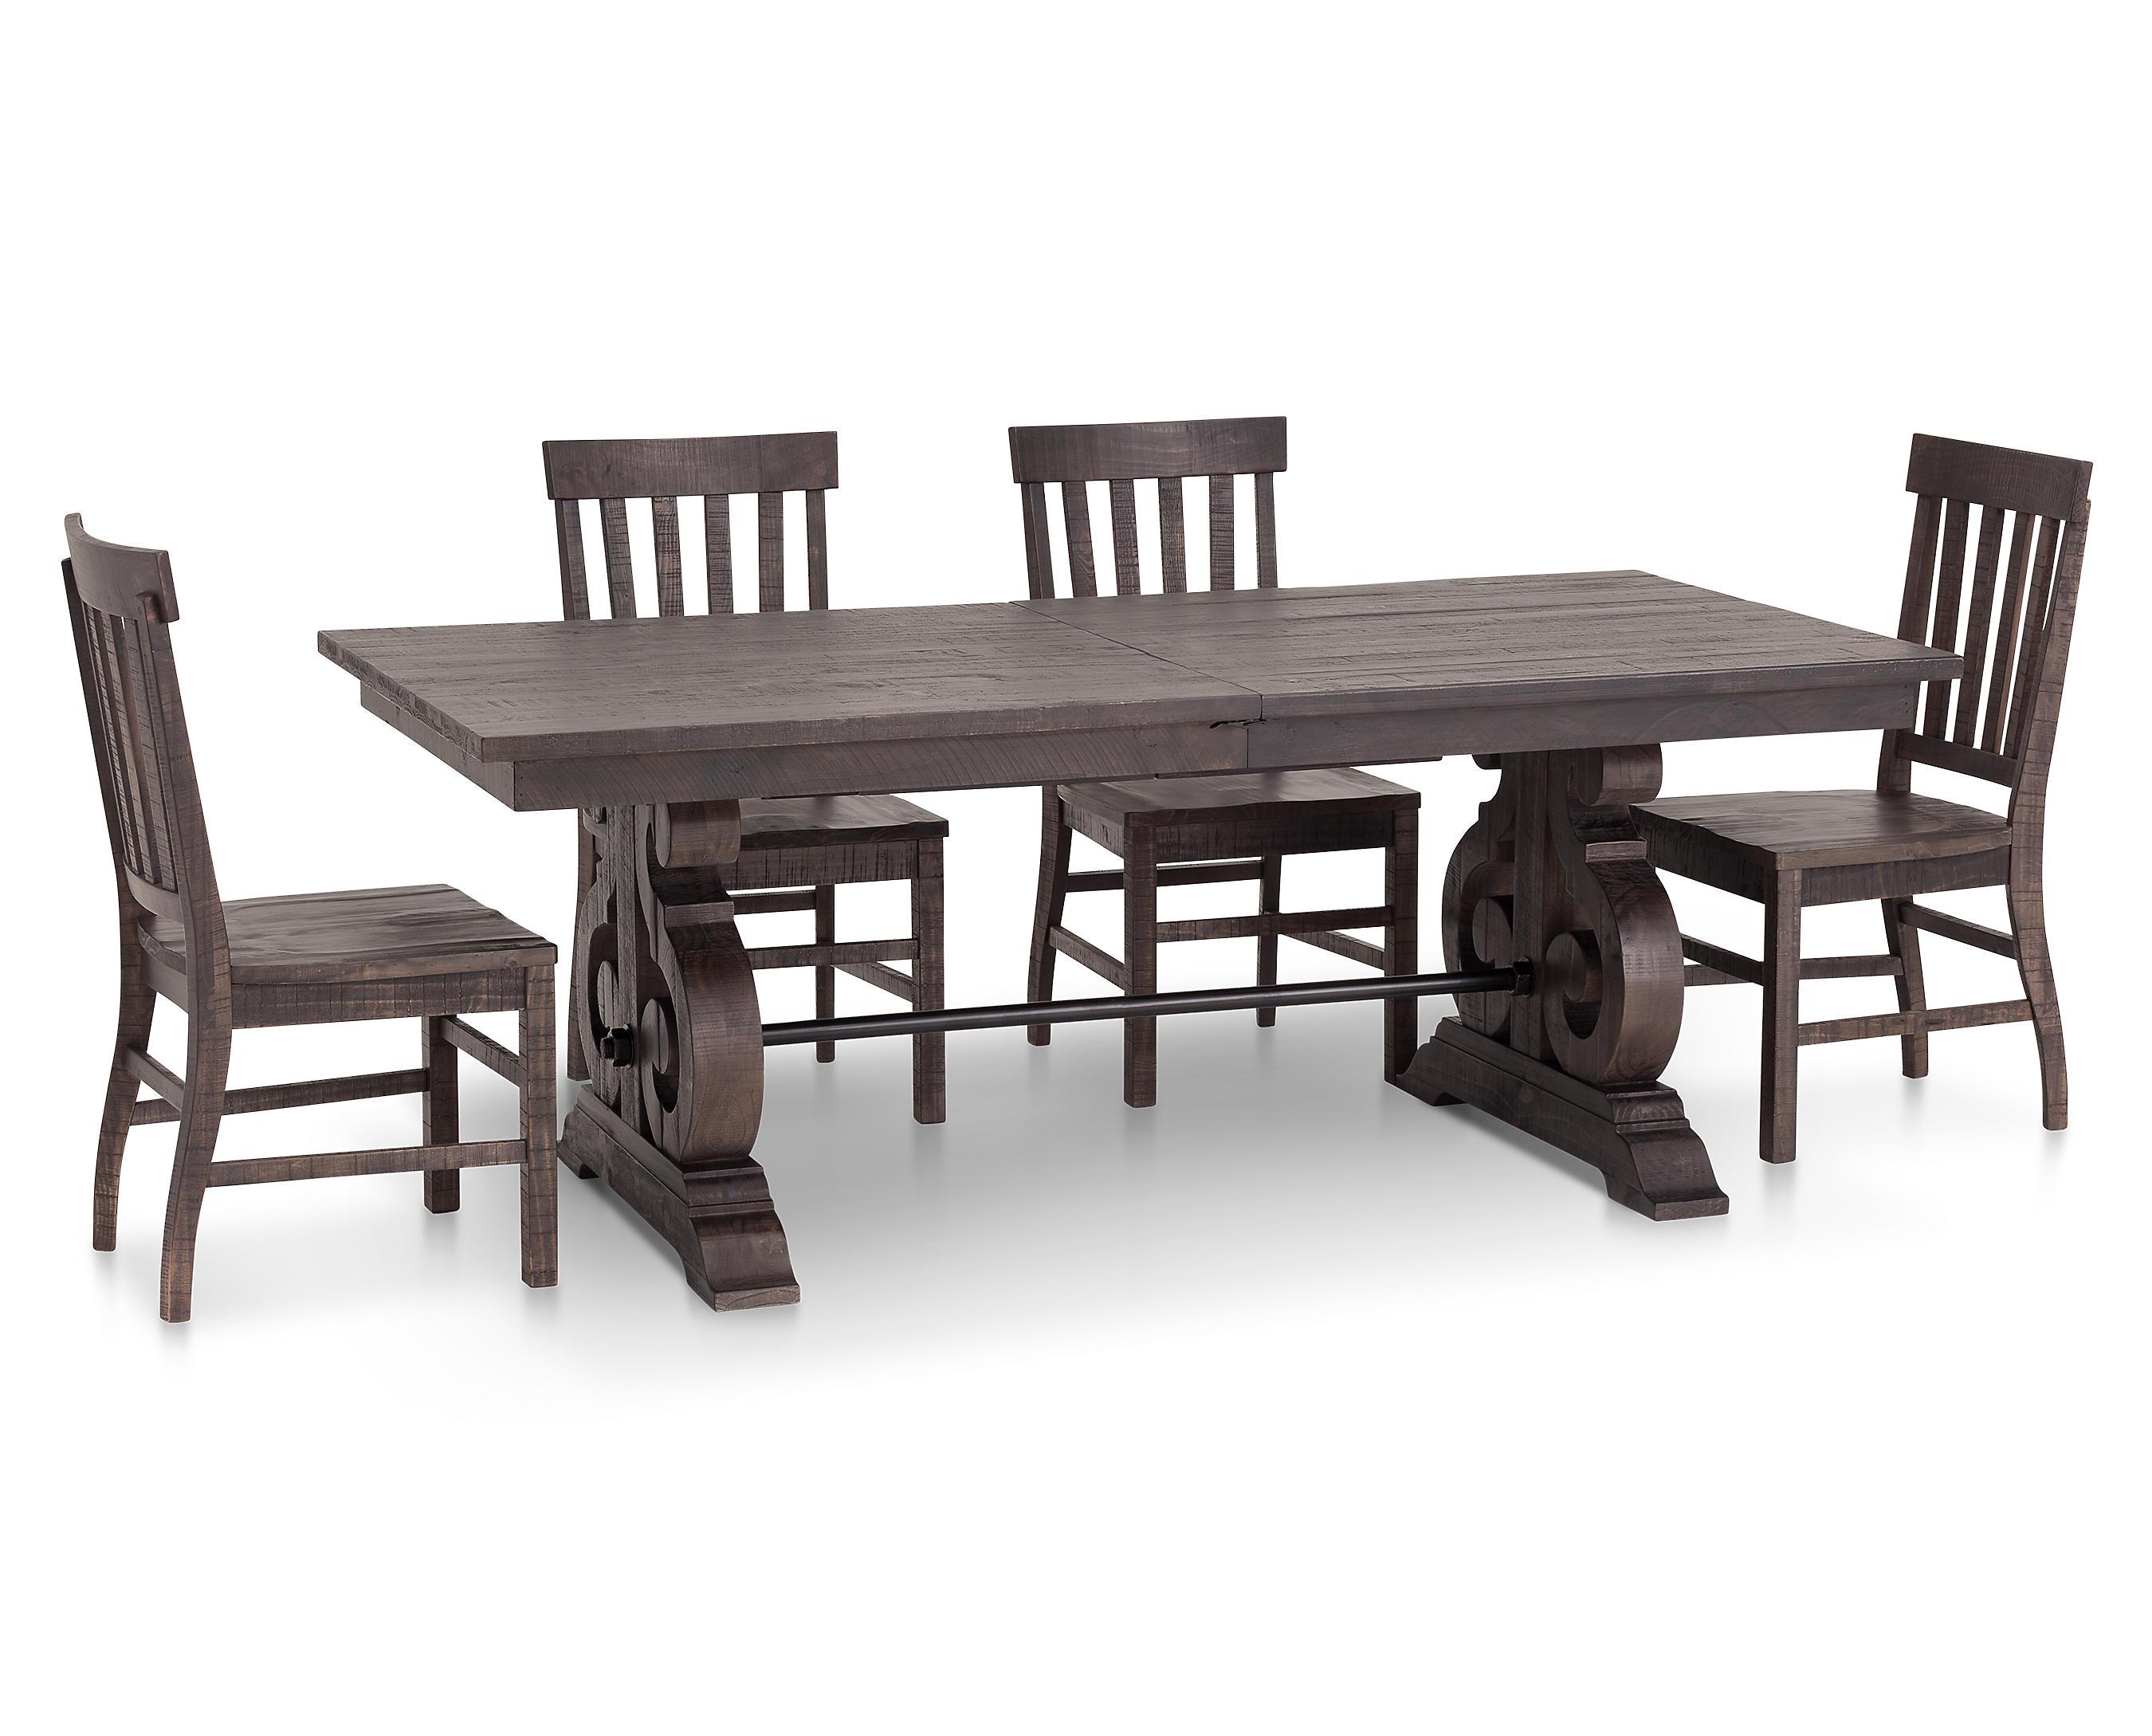 Sedona 5 Pc Dining Room Set Furniture Row